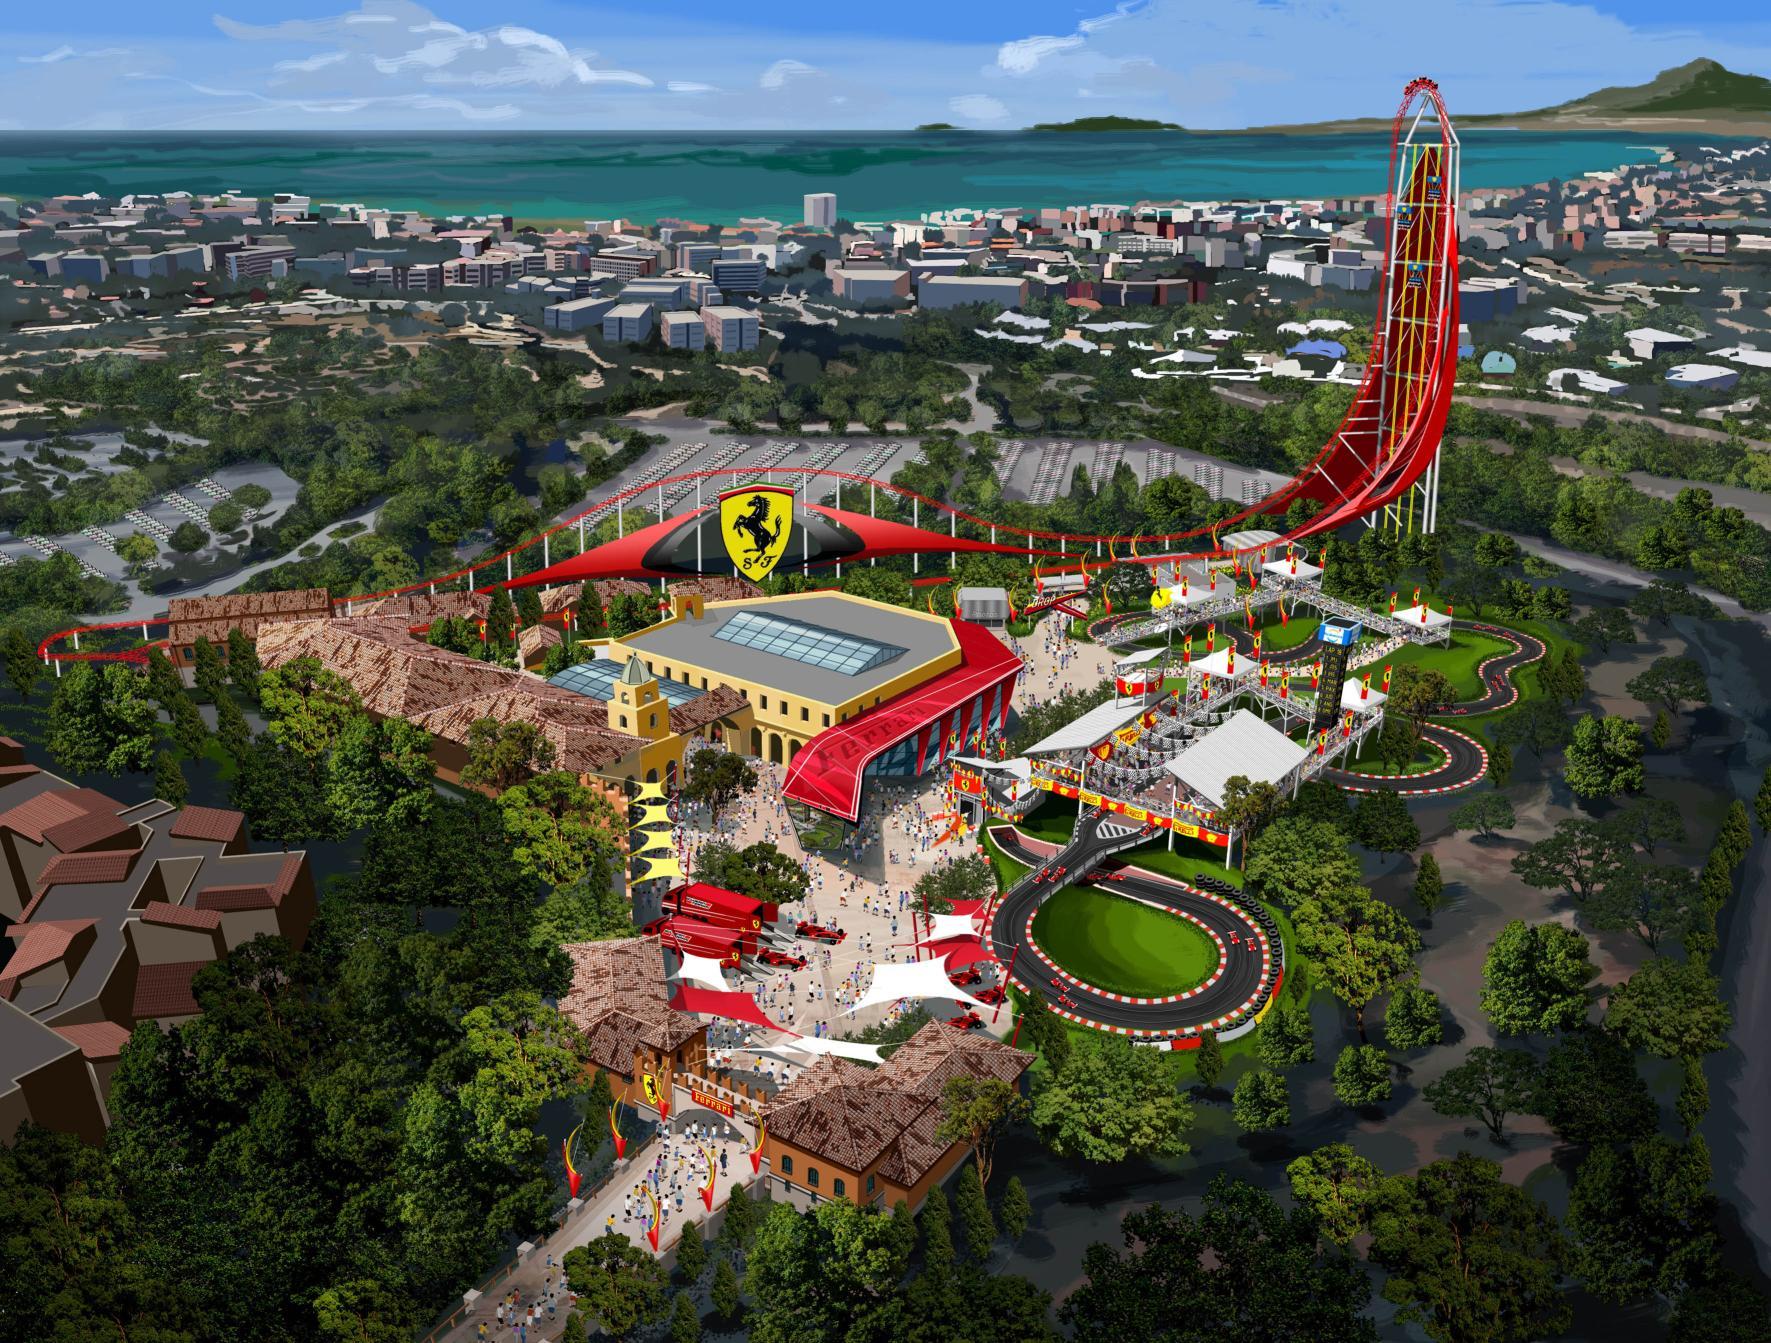 park ferrari new for ip flying aces dubai world theme interpark coaster